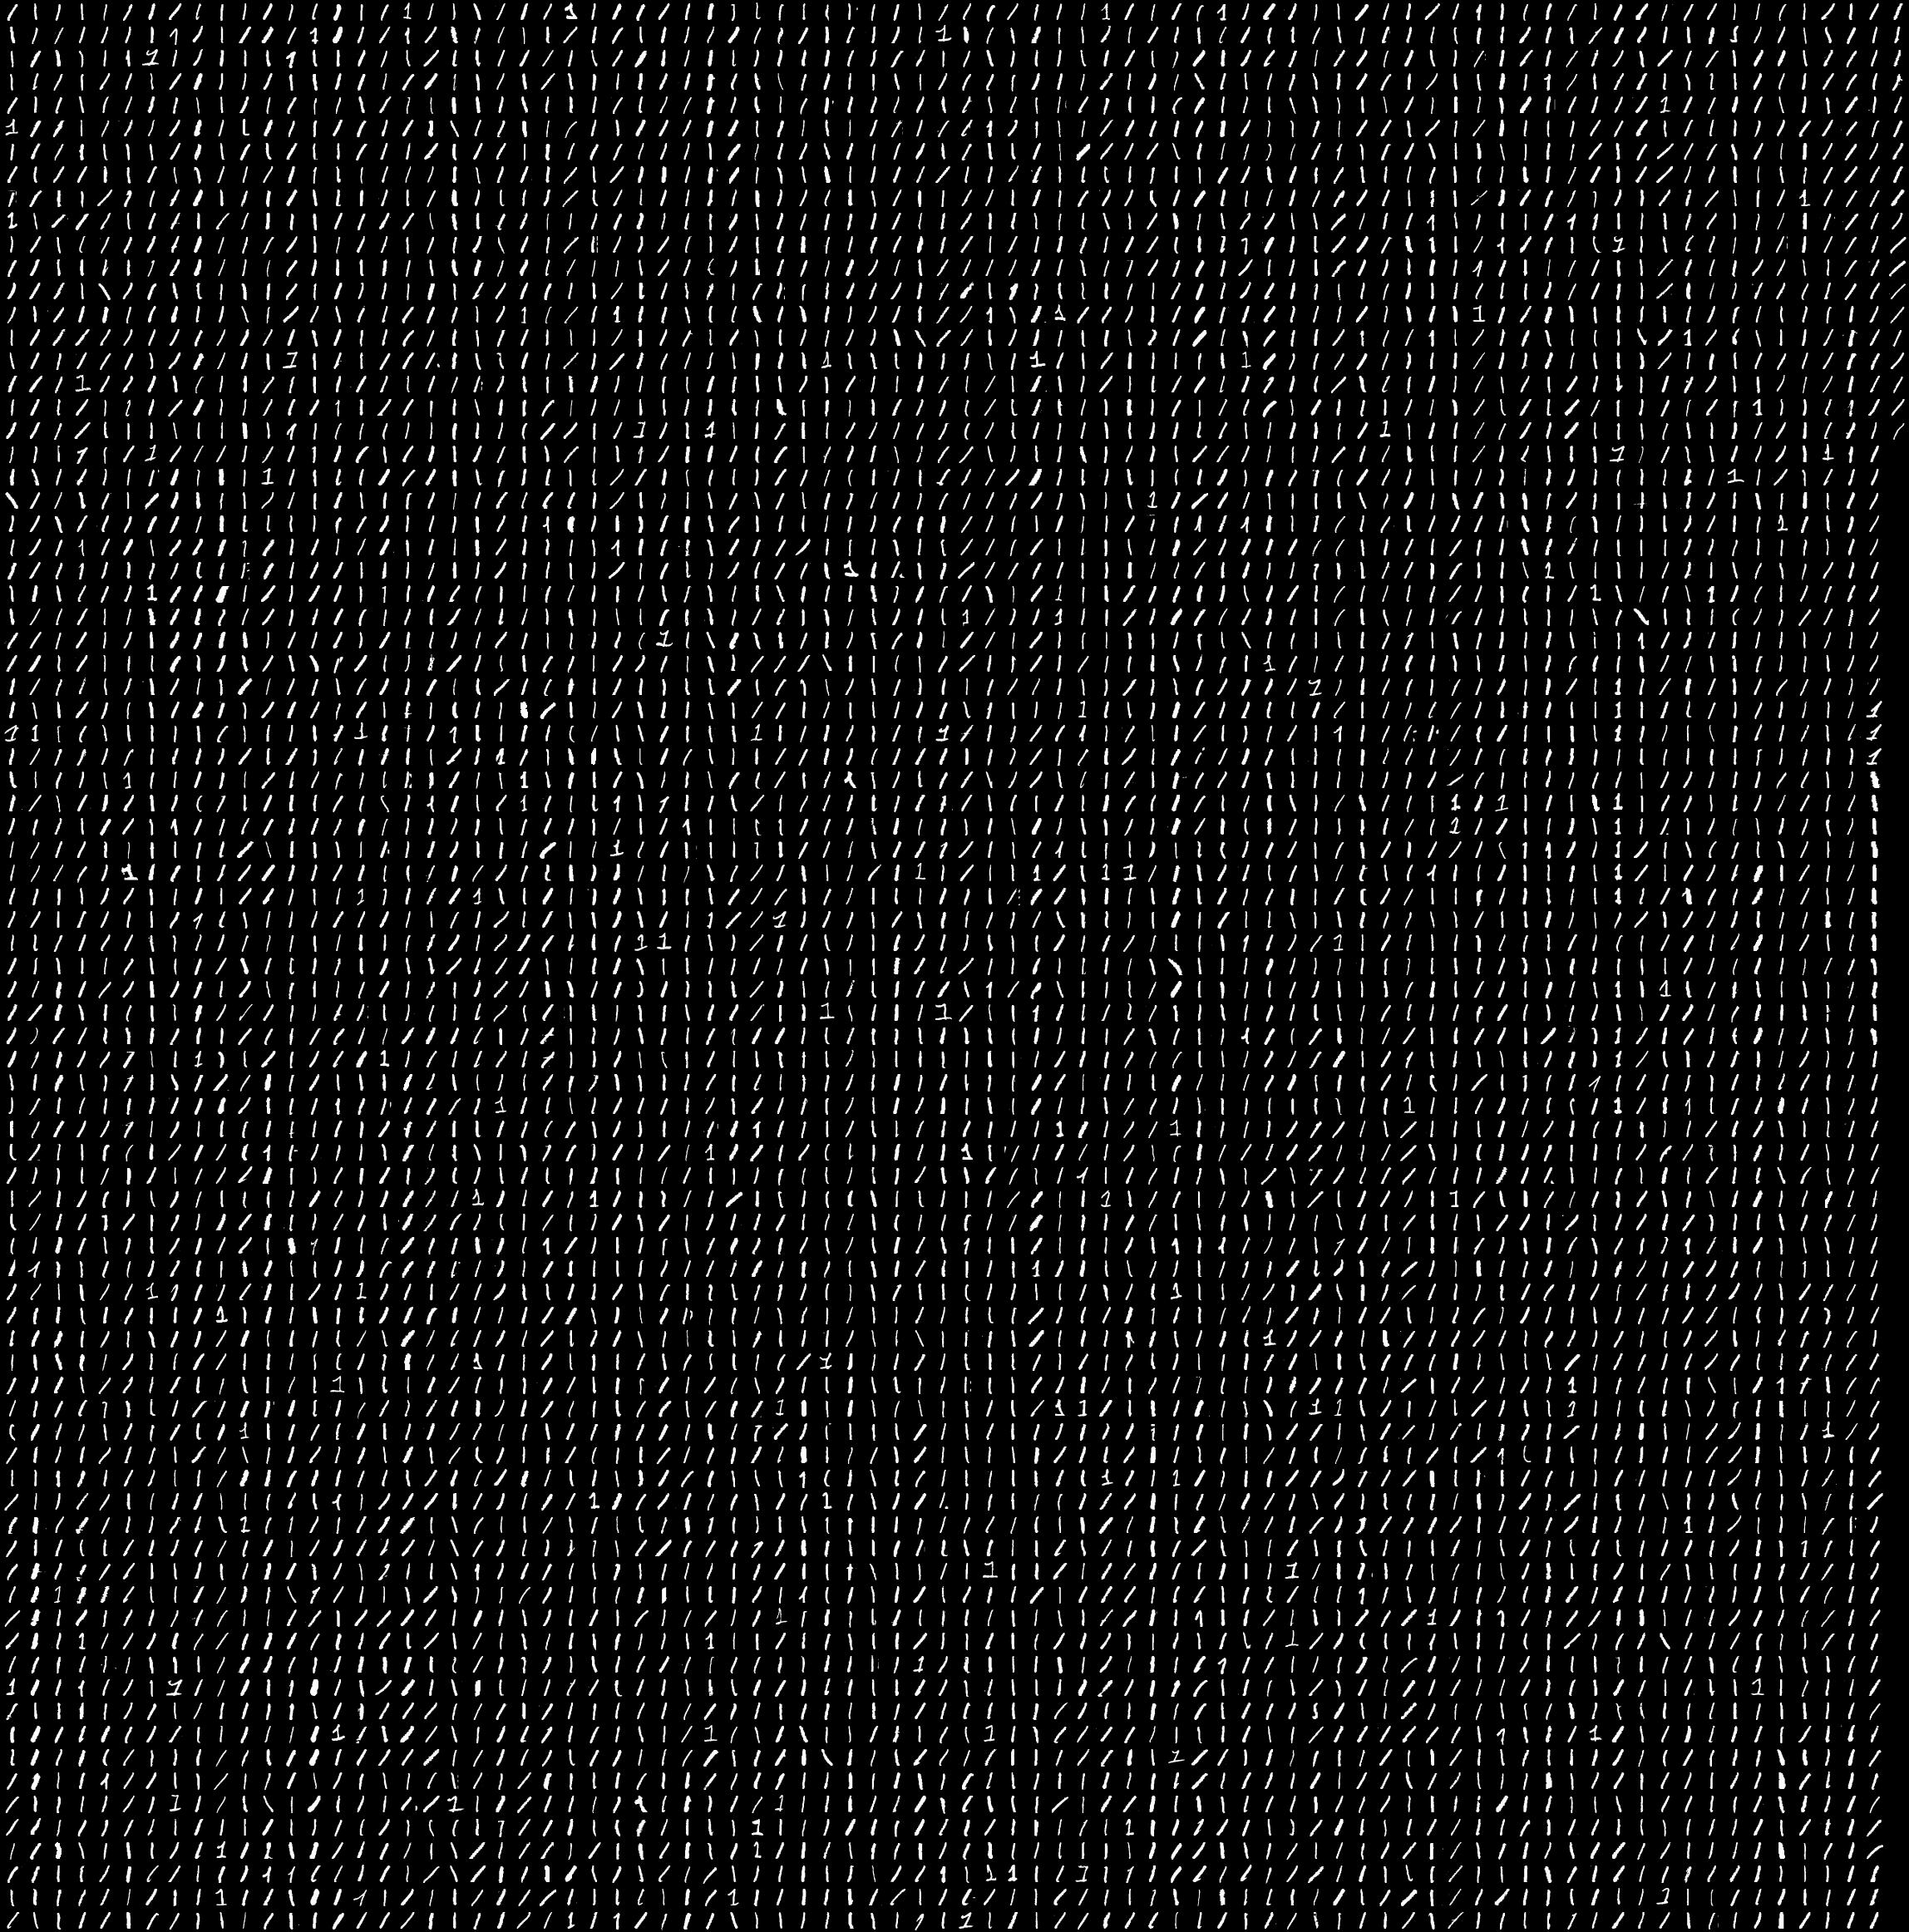 Data for MATLAB hackers